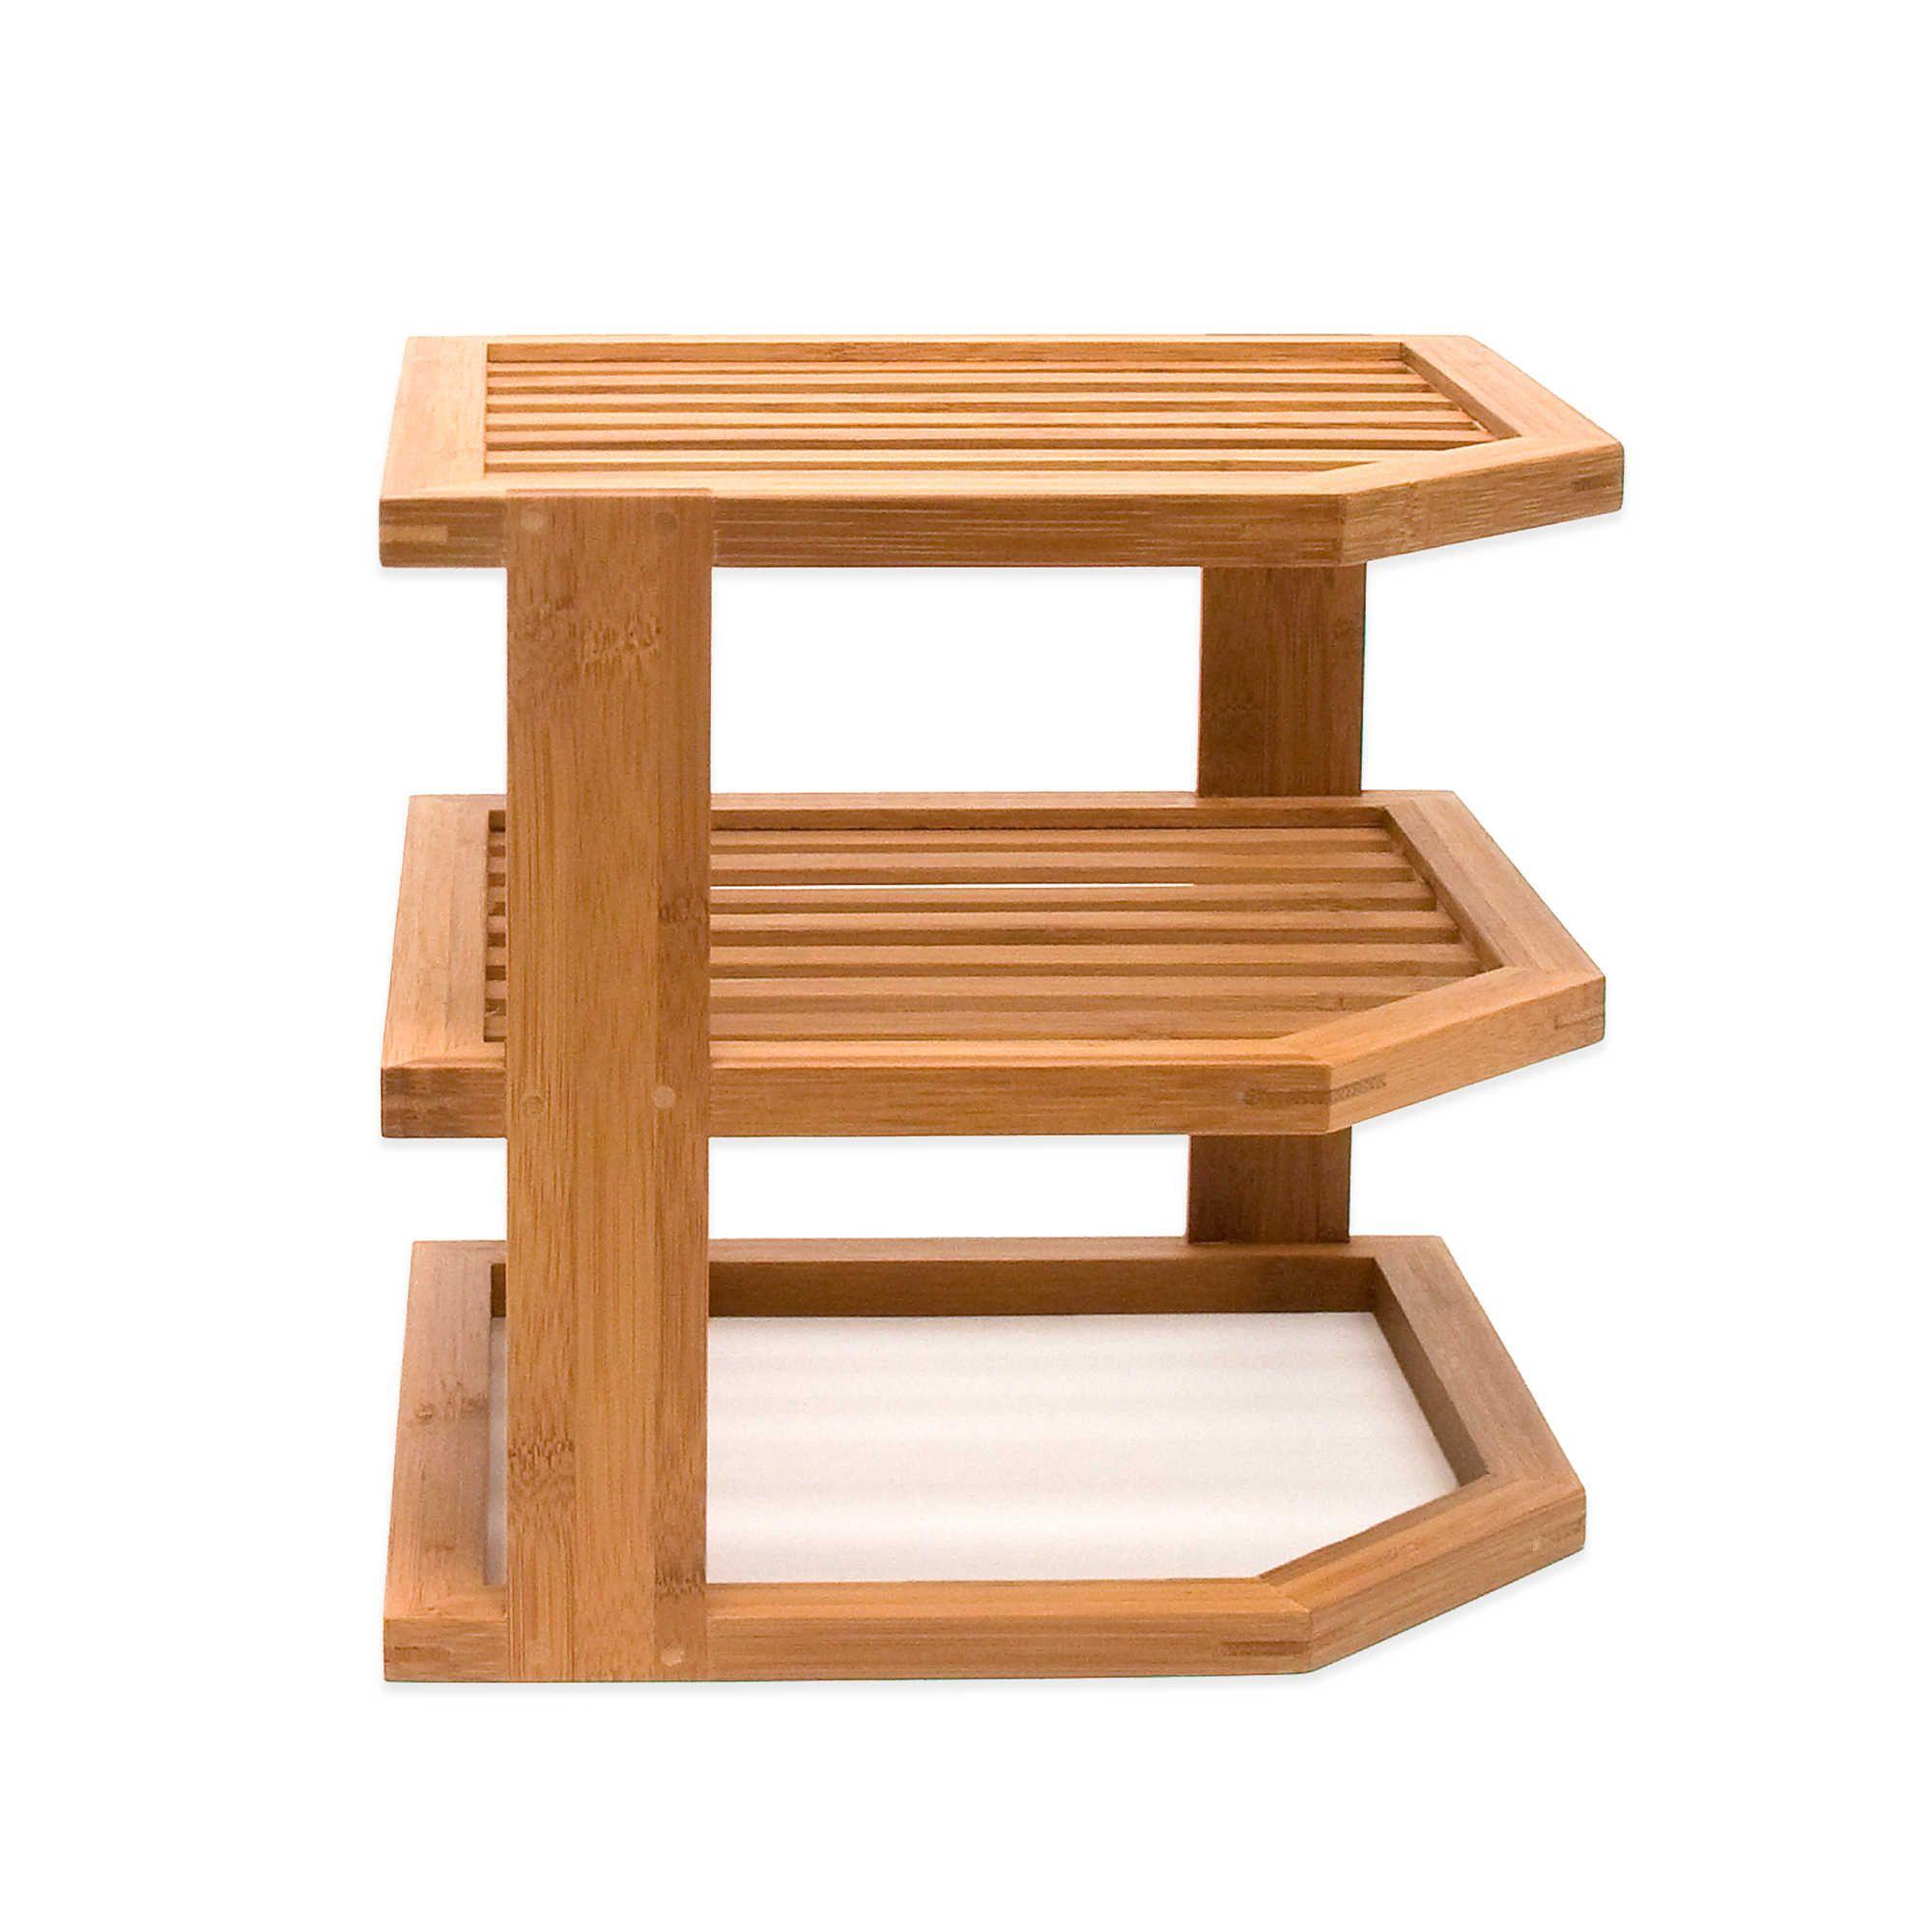 Lipper 3 Tier Corner Bamboo Shelf Bamboo Shelf Kitchen Storage Shelves Corner Shelves